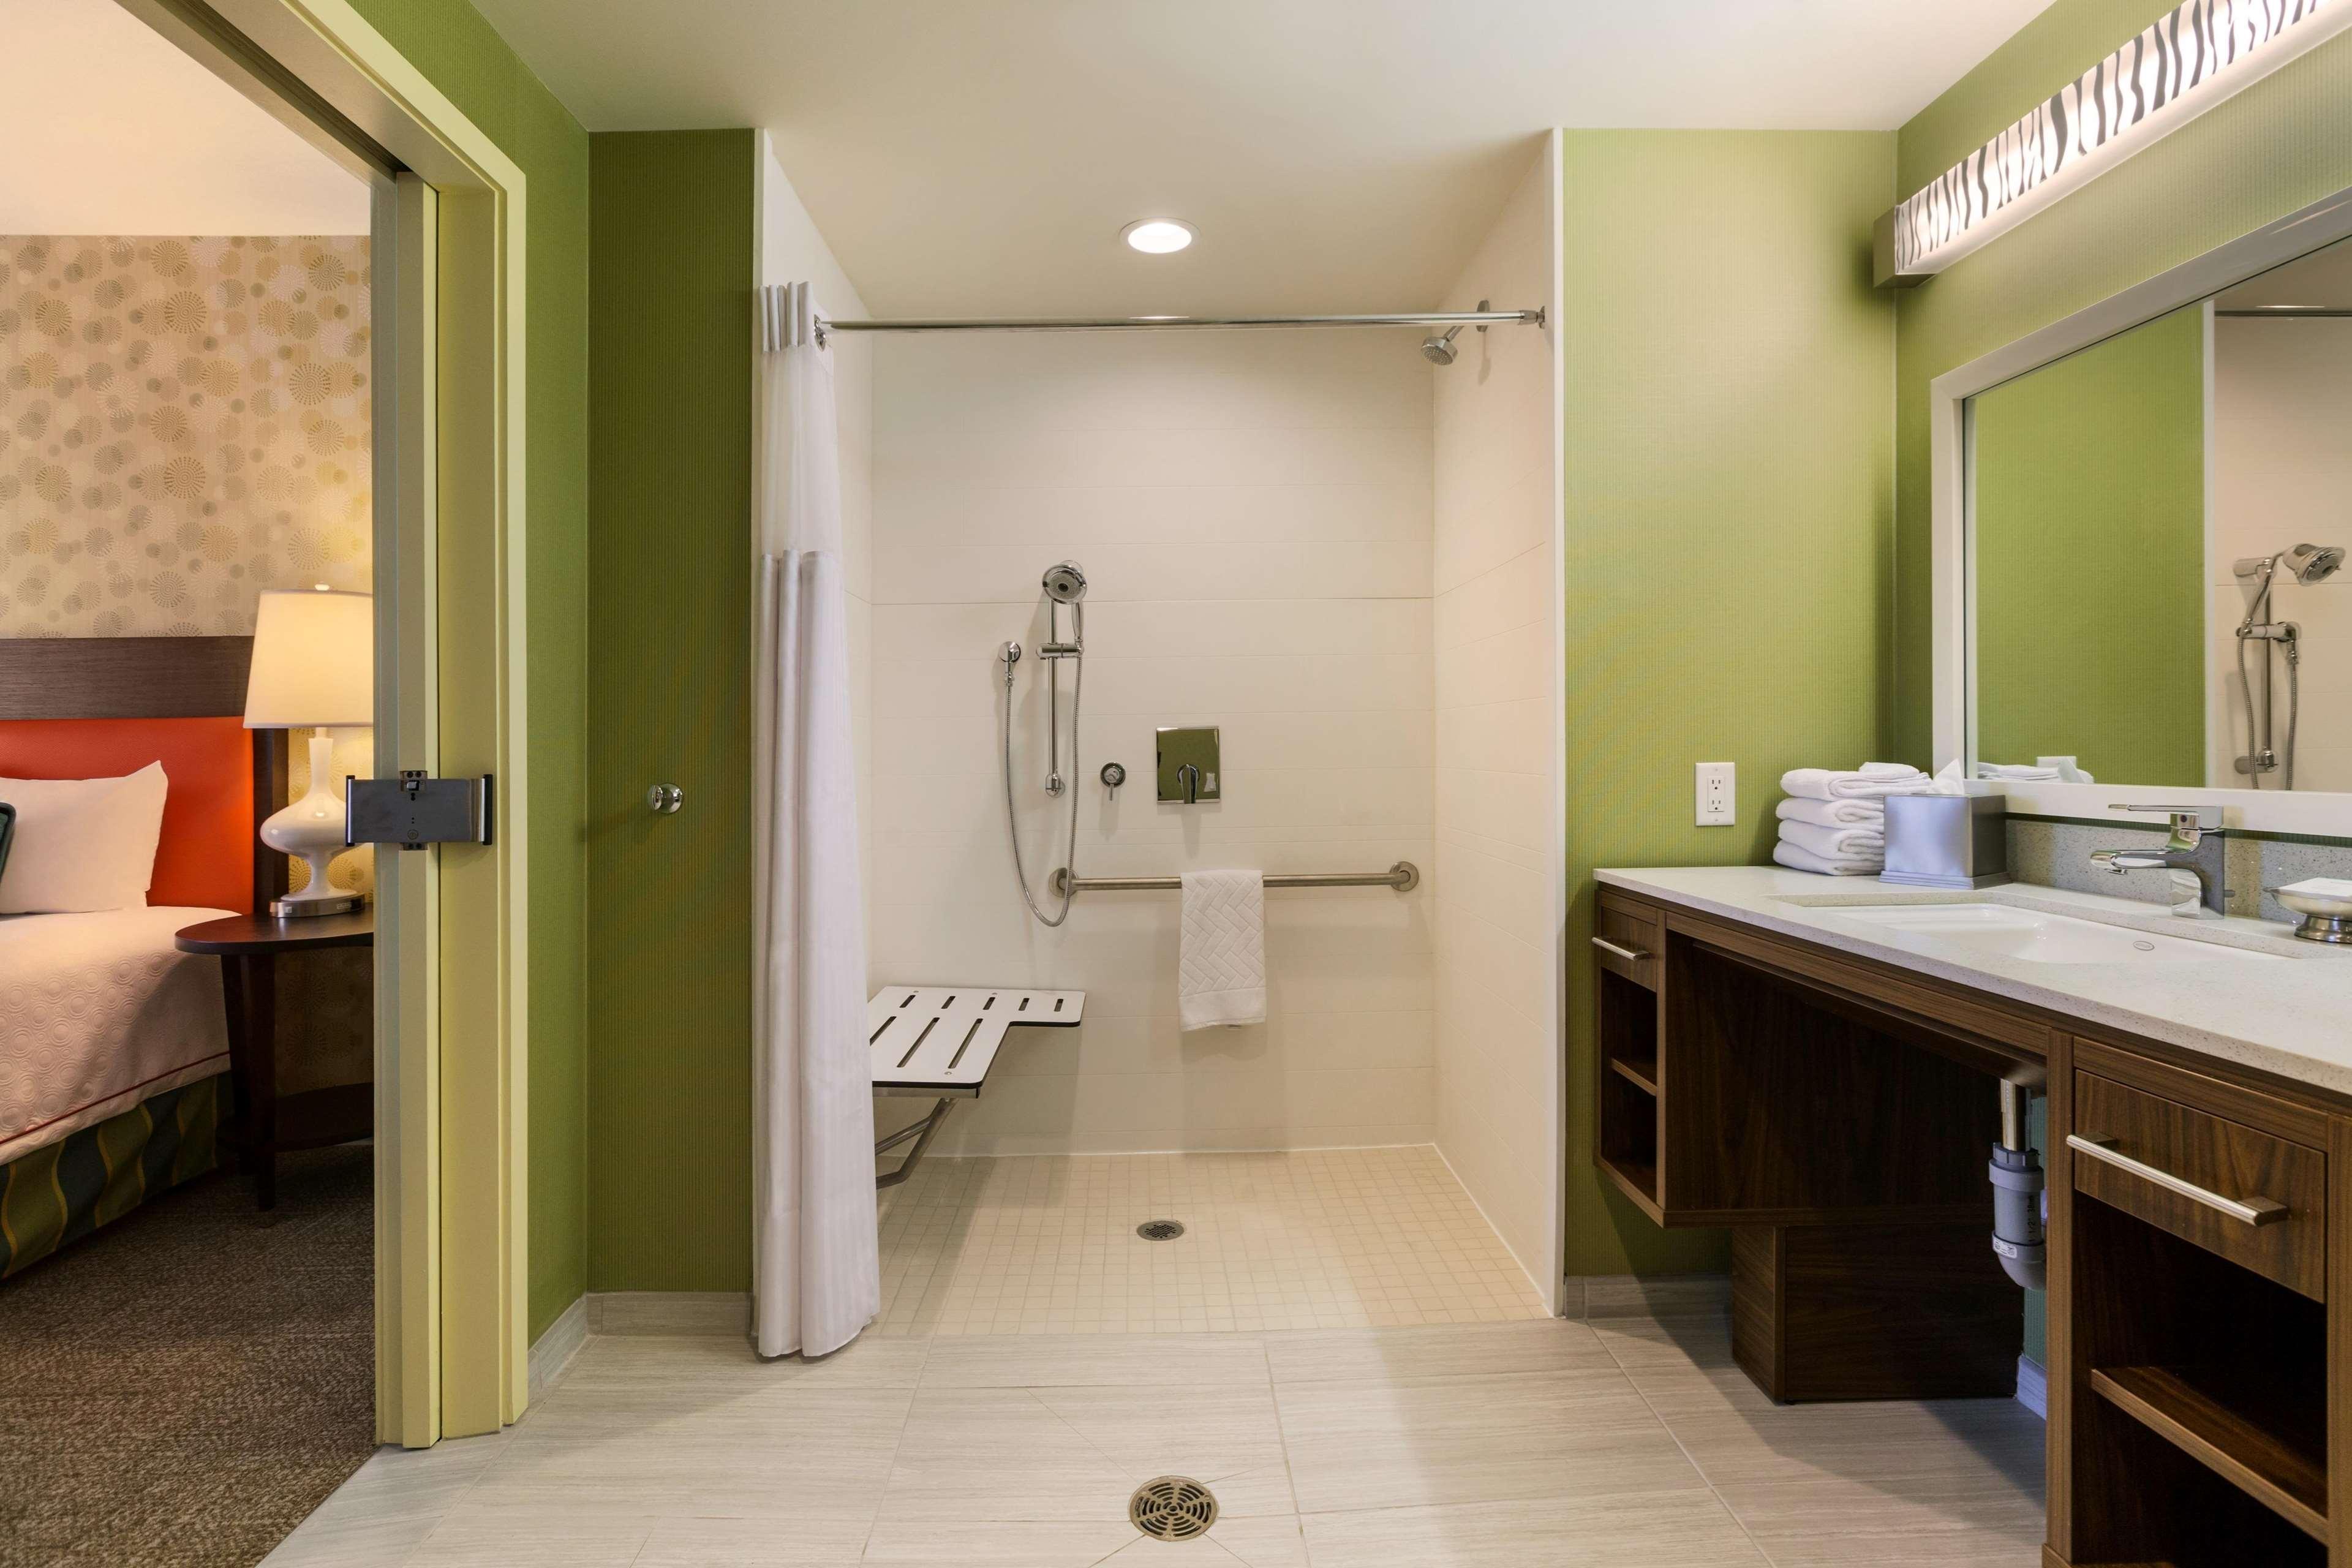 Home2 Suites by Hilton West Edmonton, Alberta, Canada à Edmonton: Accessible Bathroom Roll-in Shower